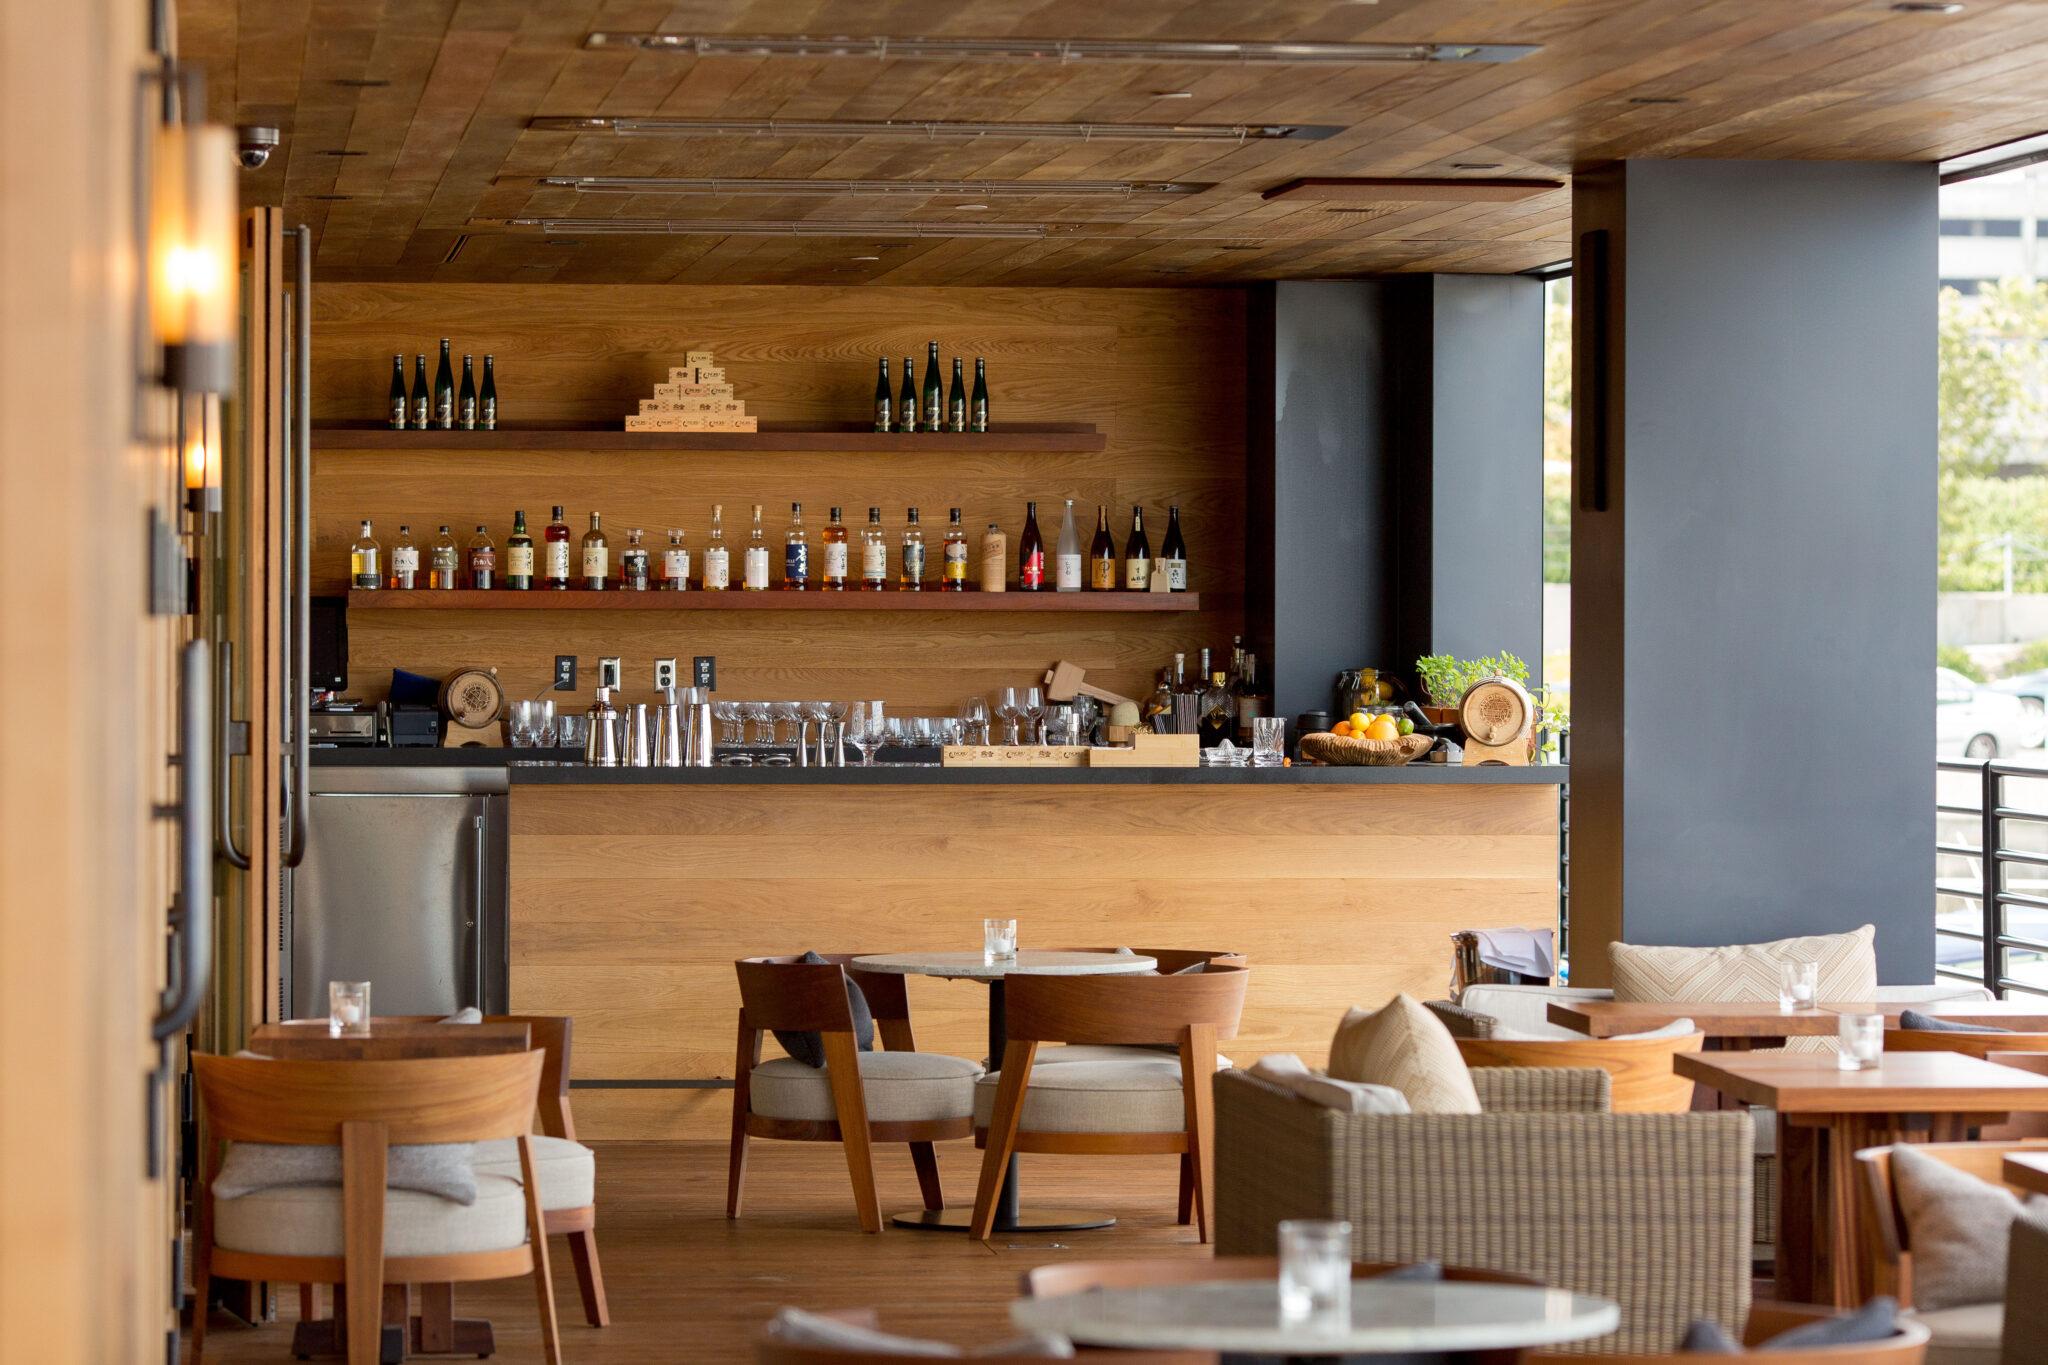 Free Range Cafe Balboa Island Menu